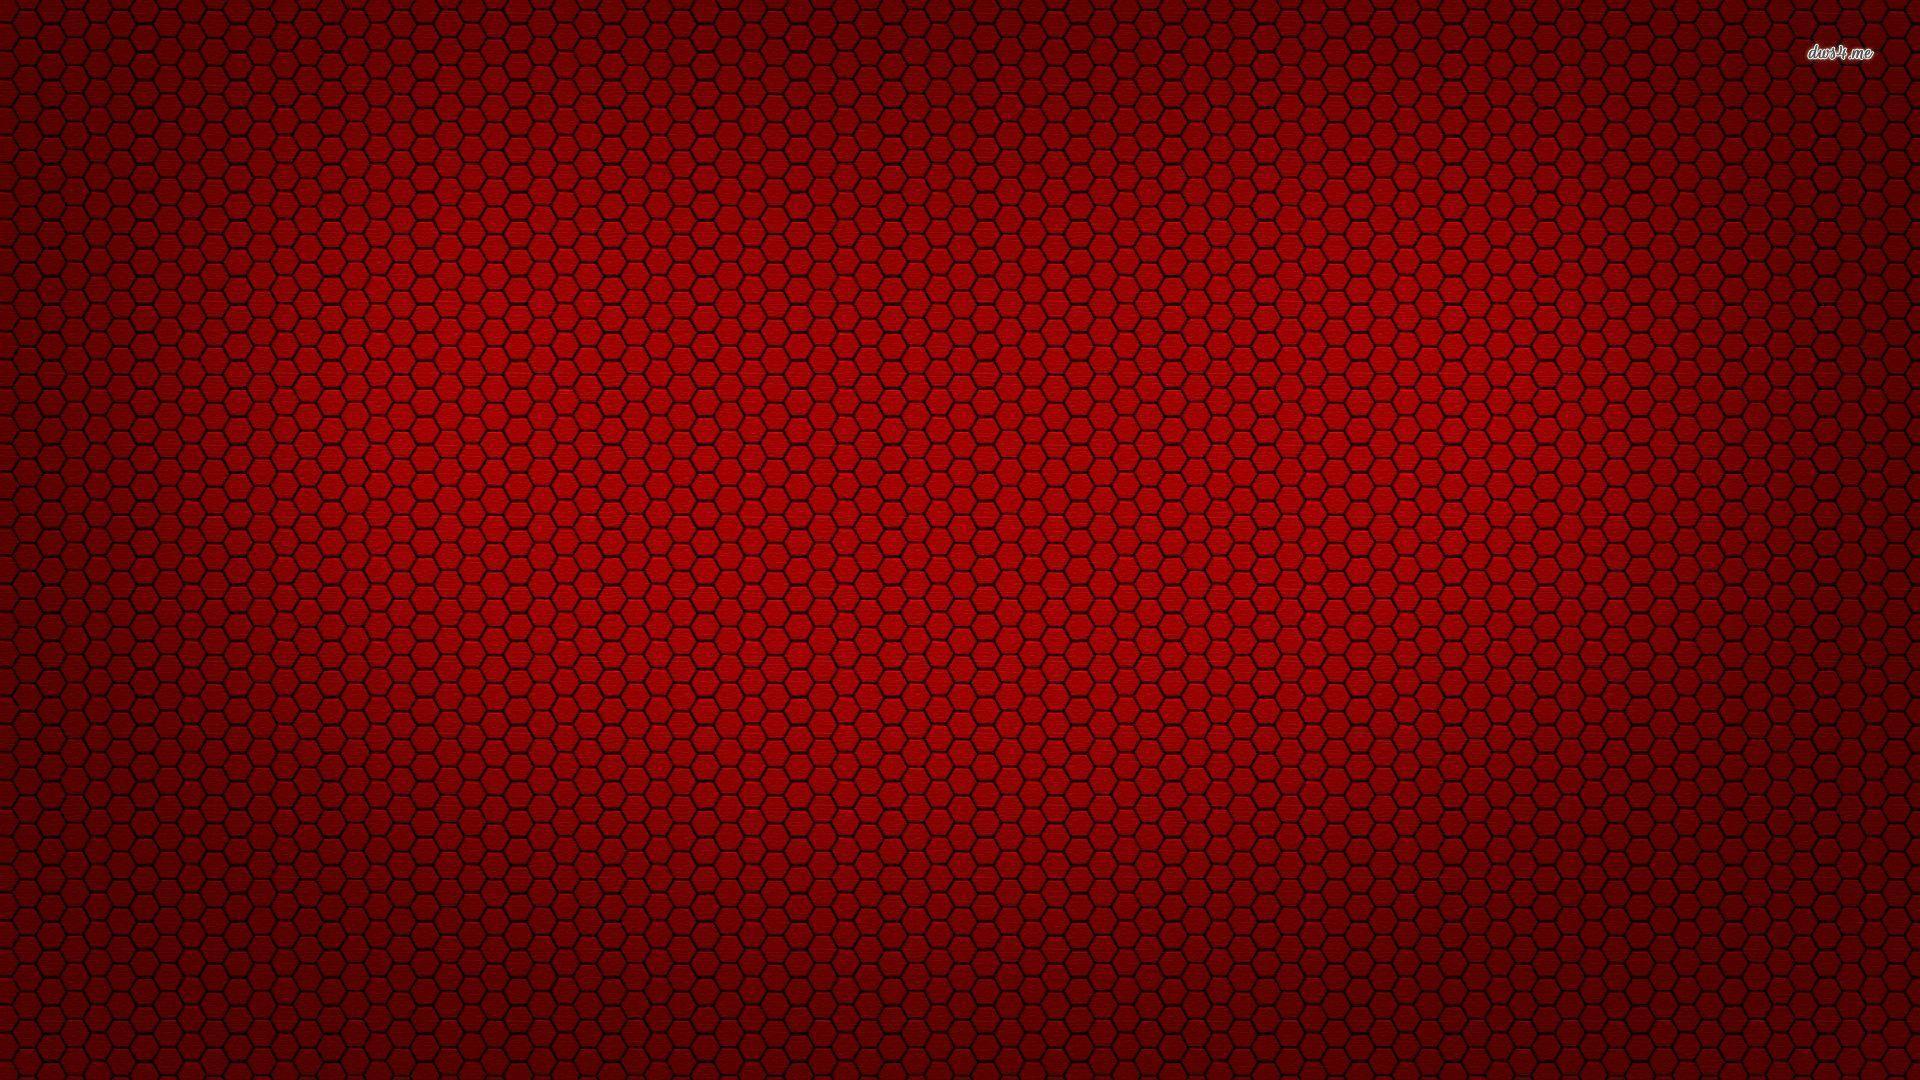 Red Carbon Fiber Wallpapers - Top Free Red Carbon Fiber ...